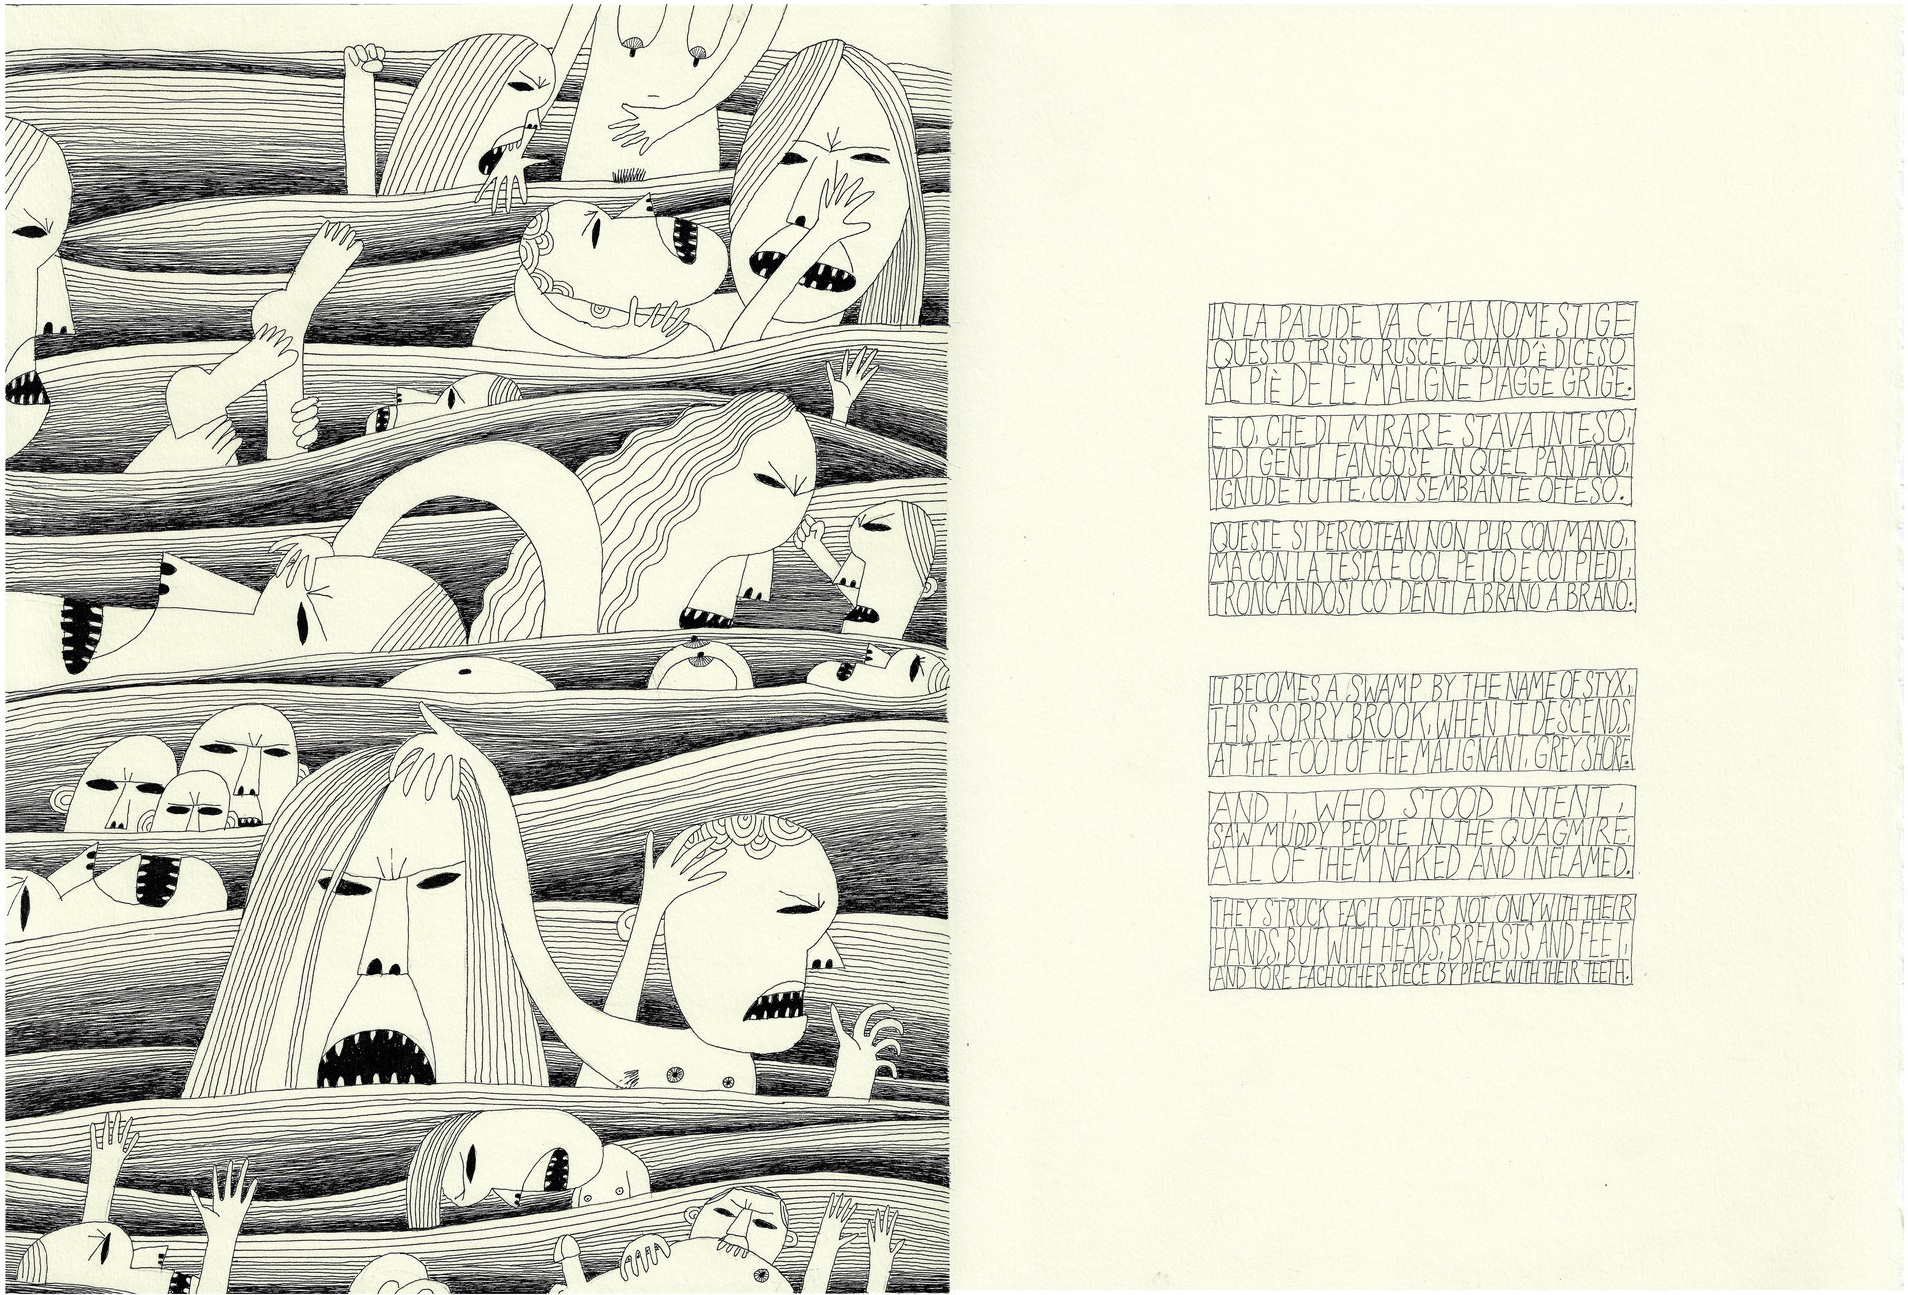 Illustrating Dante's Inferno_Infosession_Full Program_Page_43.jpg